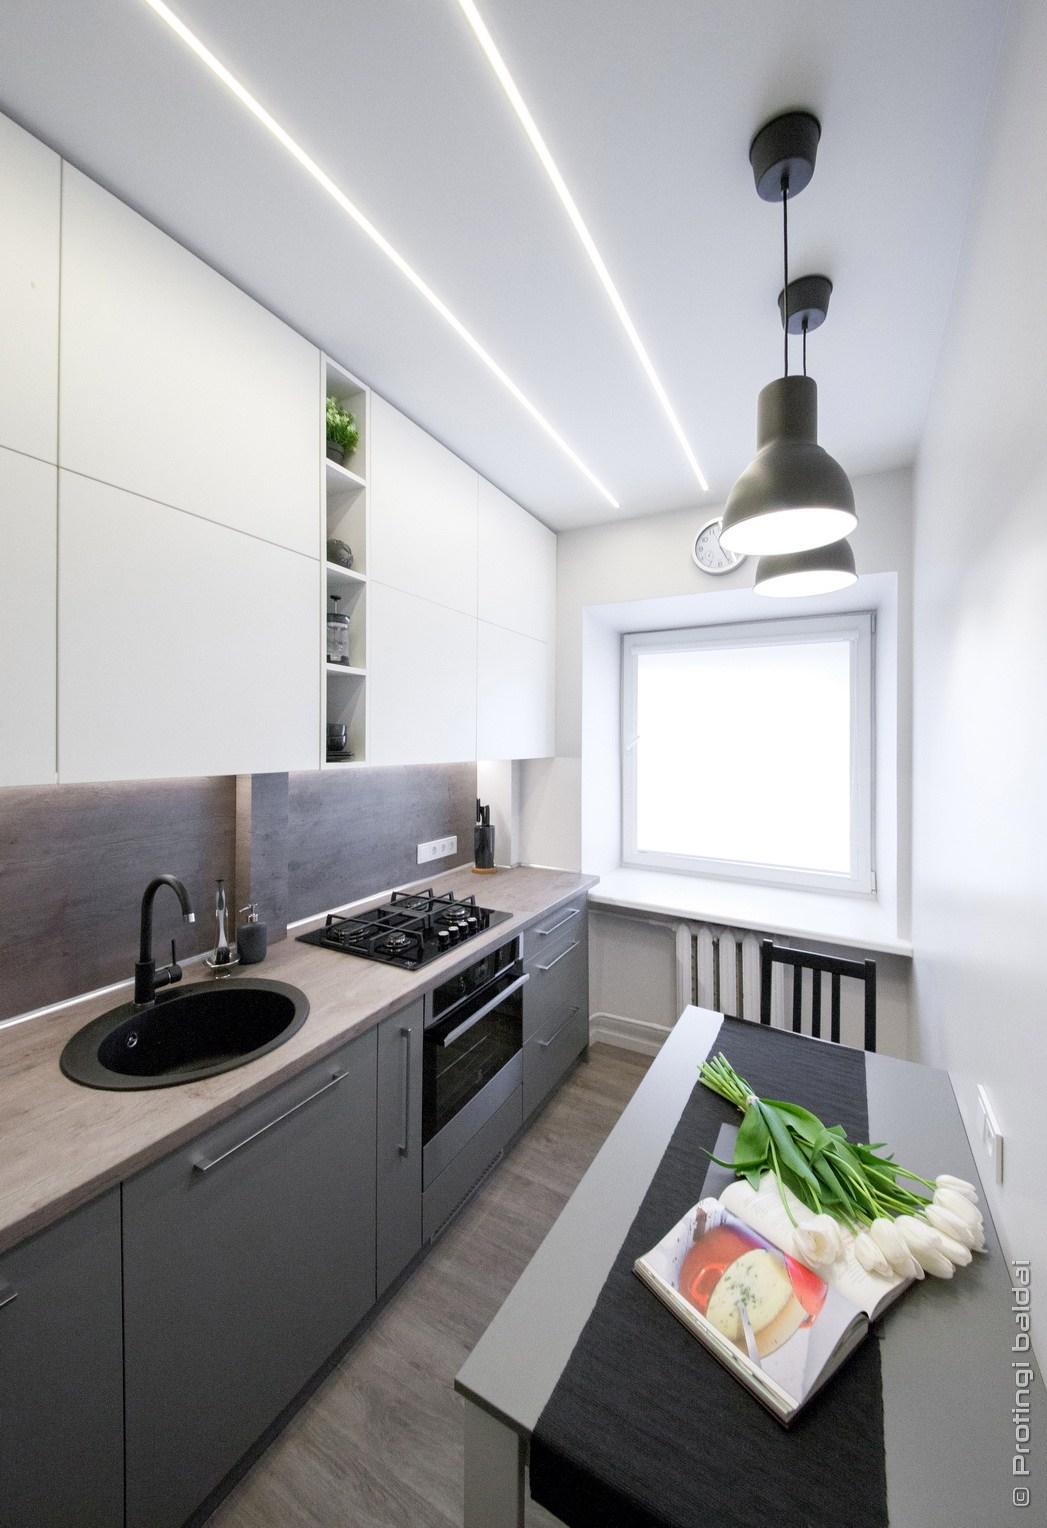 virtuve_vaiku_baldai_PB21_13